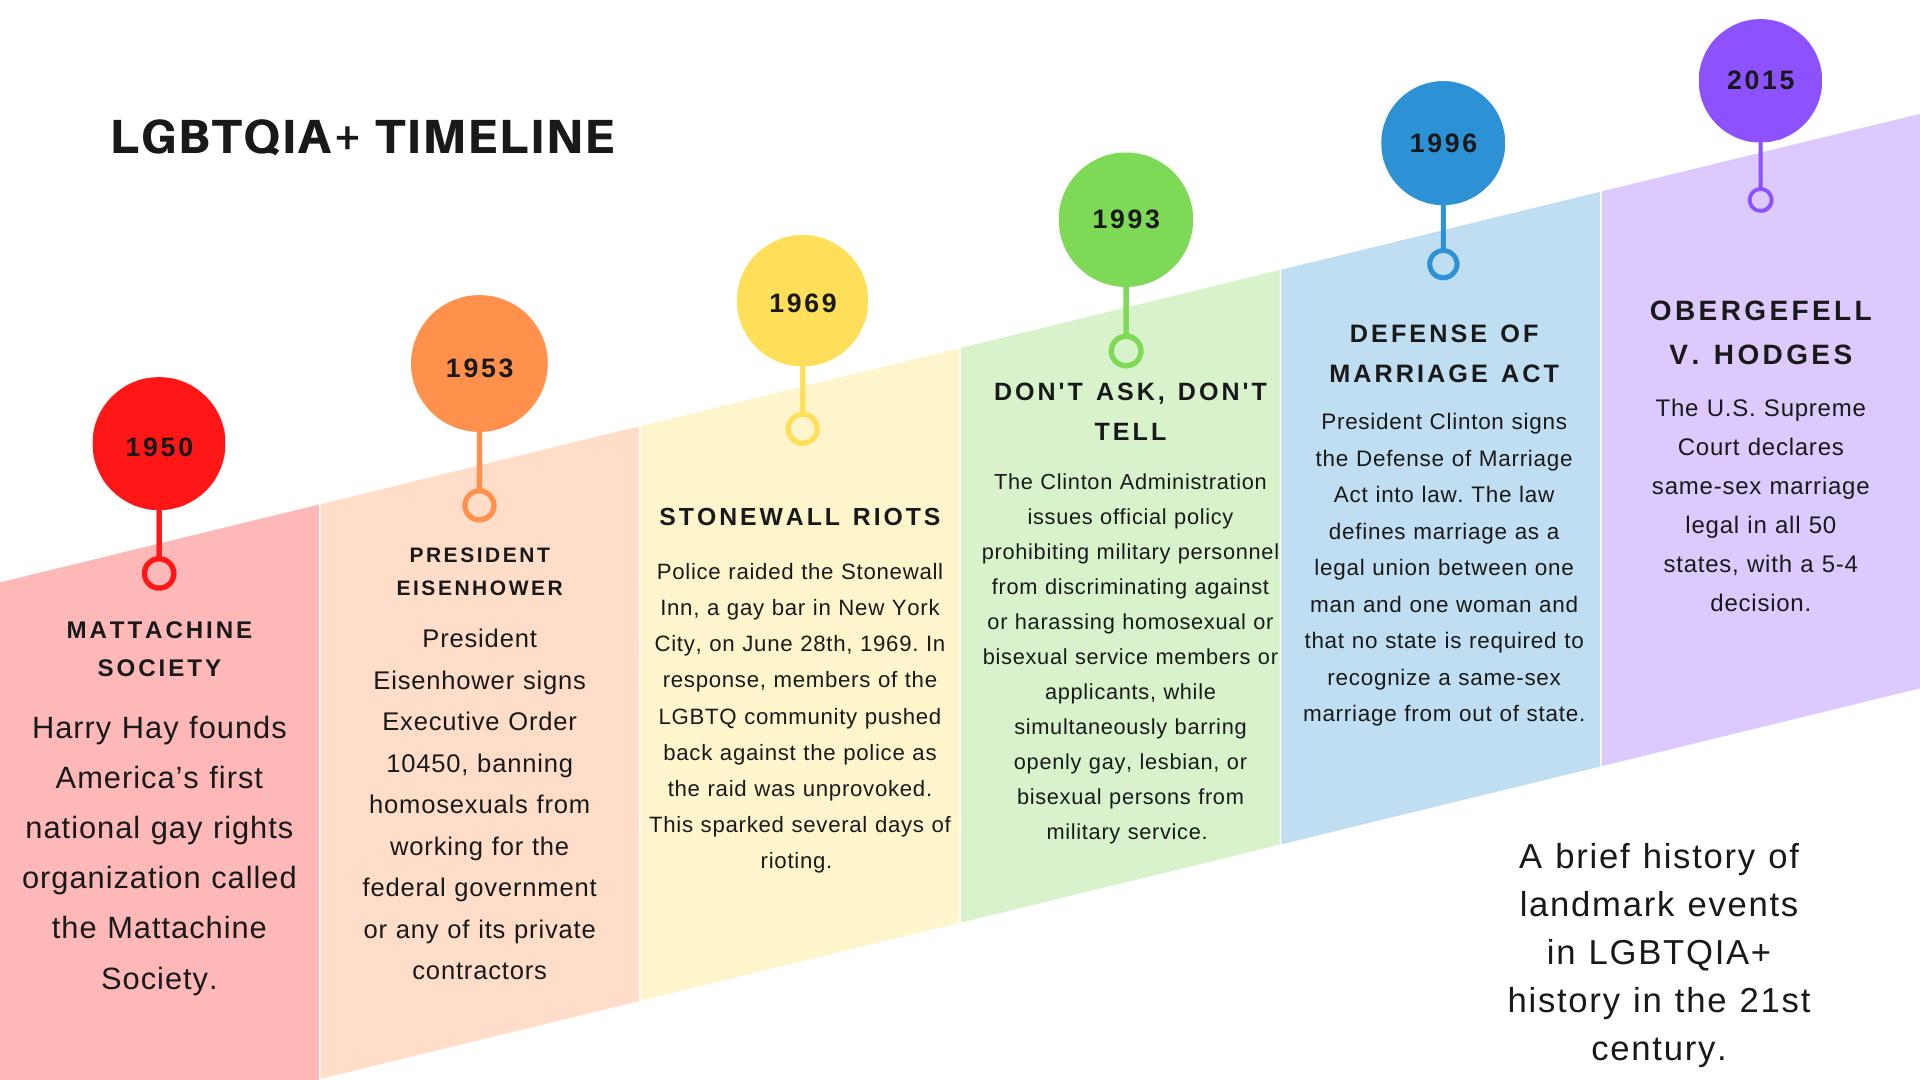 LGBTQIA+ timeline